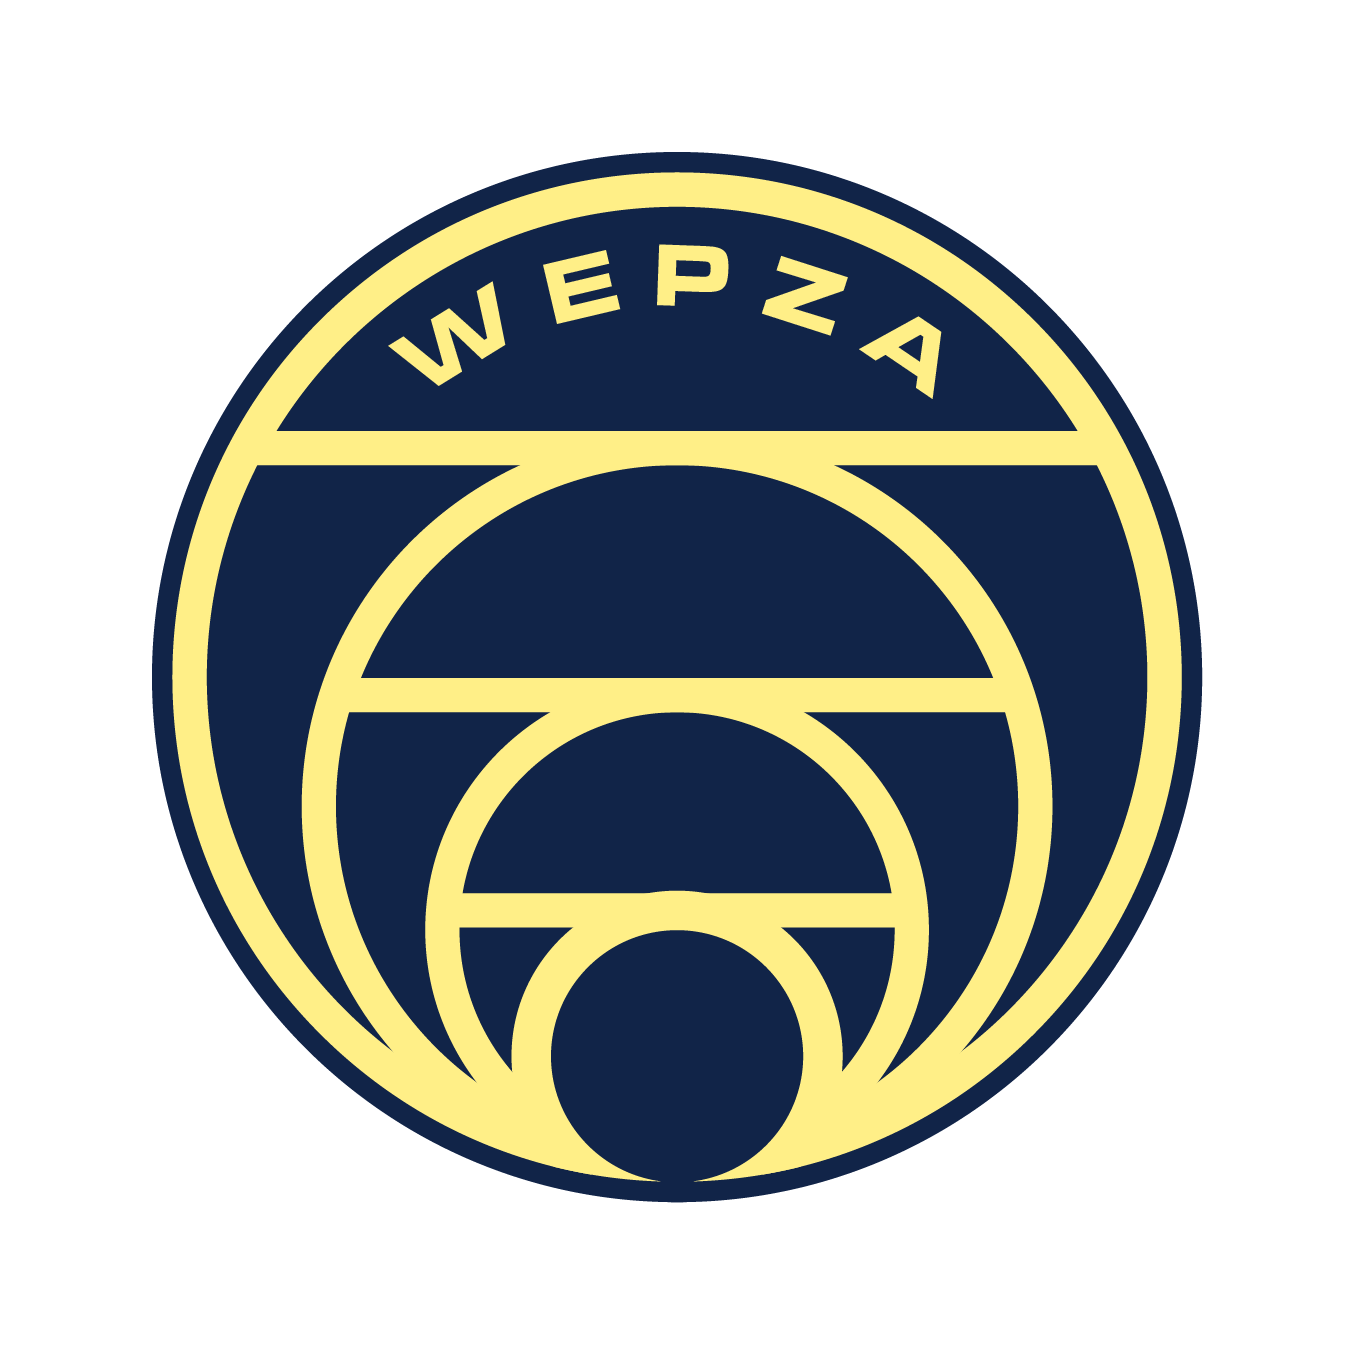 WEPZA Secretariat HQ  The Manor, Hull Place, Sholden  Deal, Kent, CT14-0AQ  United Kingdom